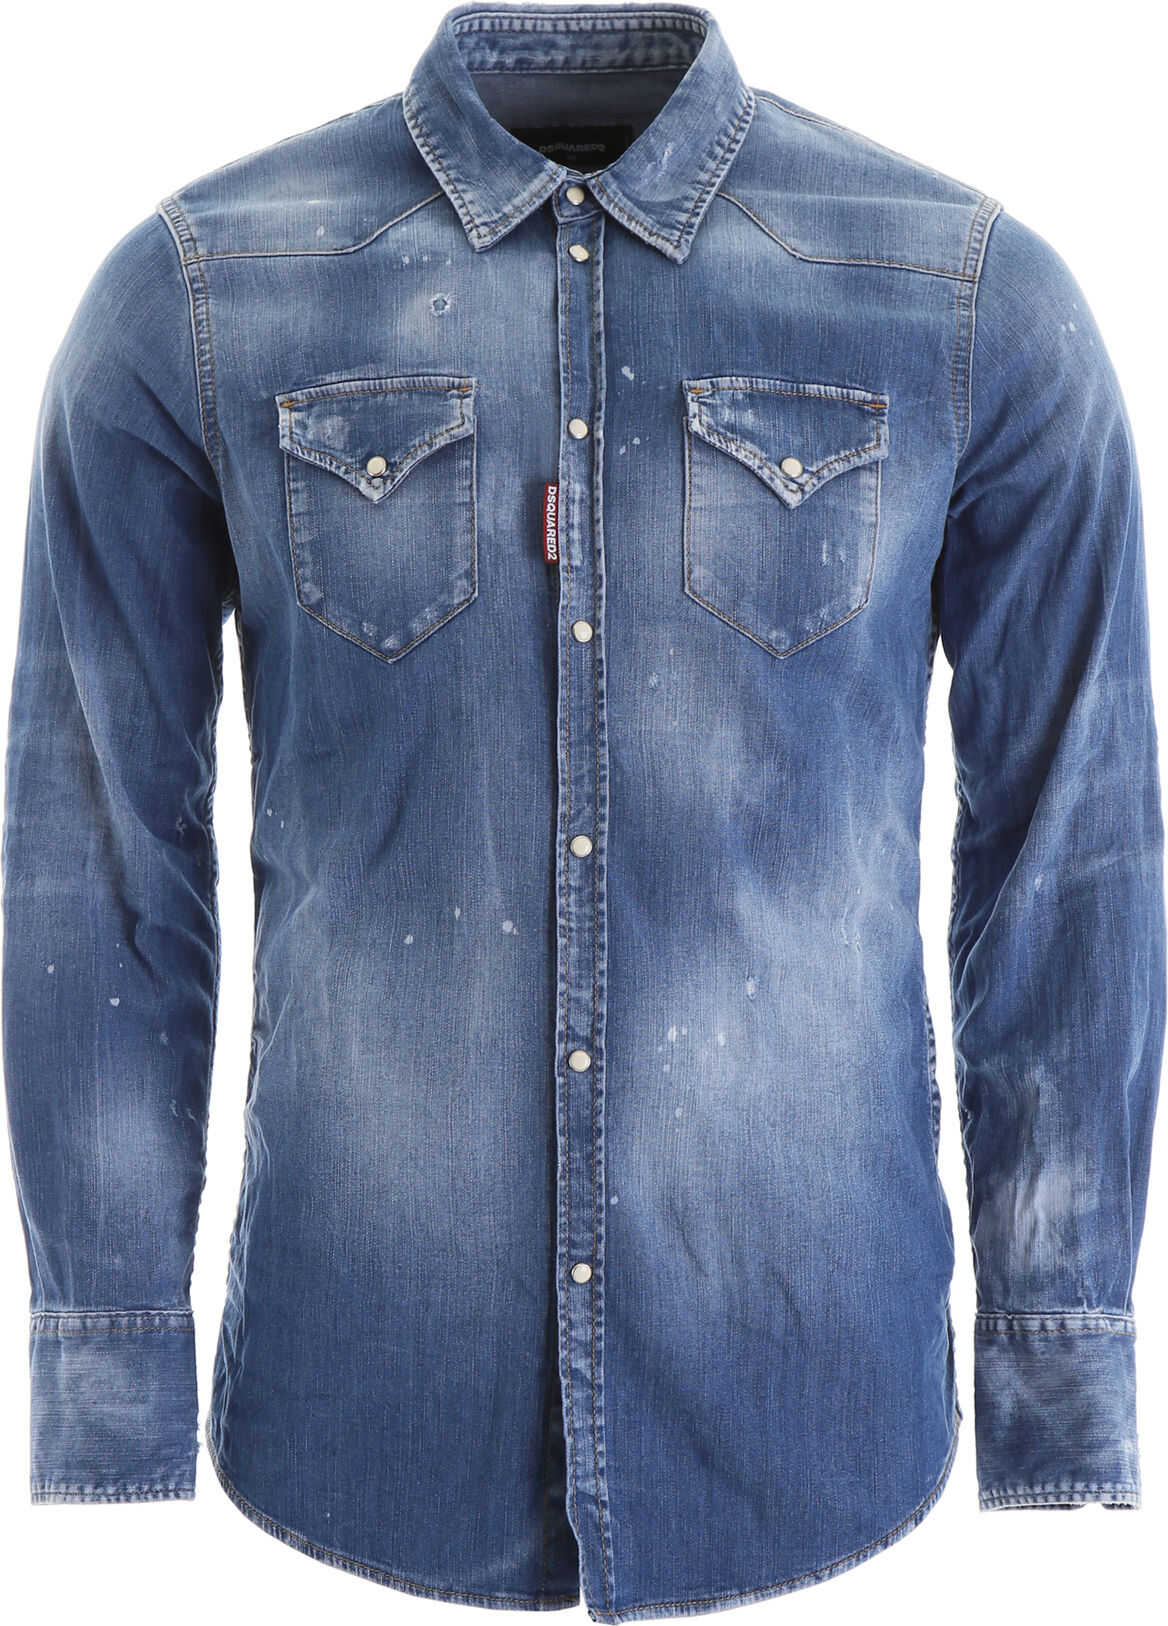 DSQUARED2 Denim Shirt BLUE